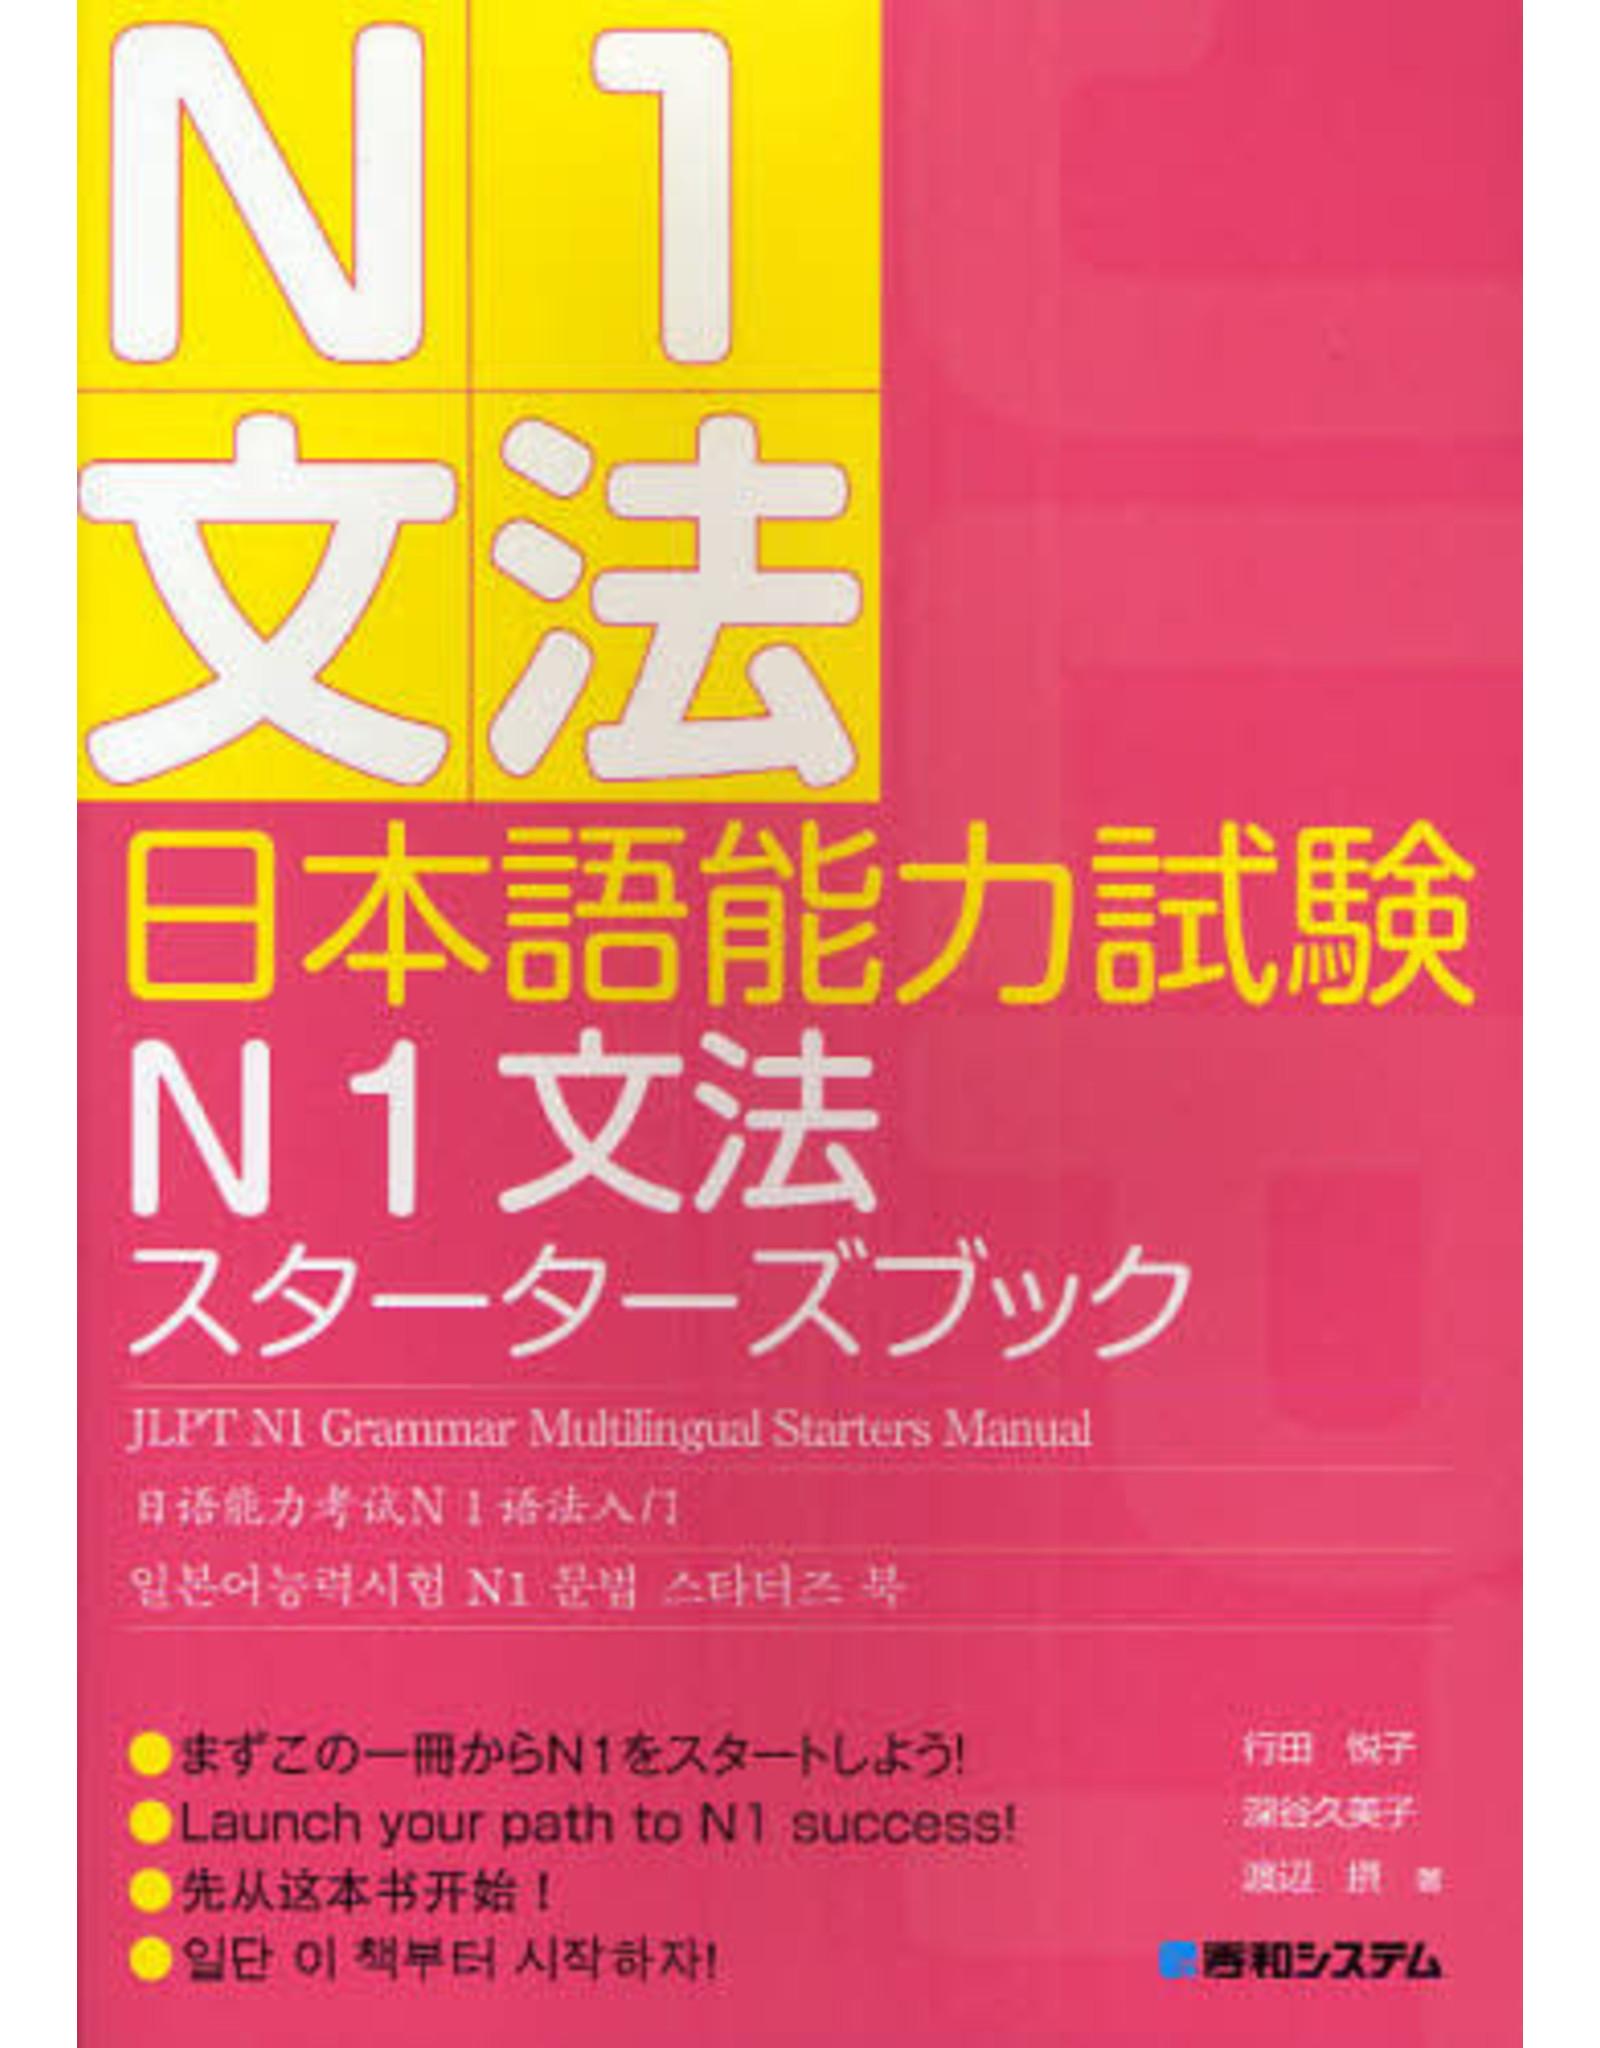 JLPT N1 GRAMMAR MULTILINGUAL STARTERS MANUAL